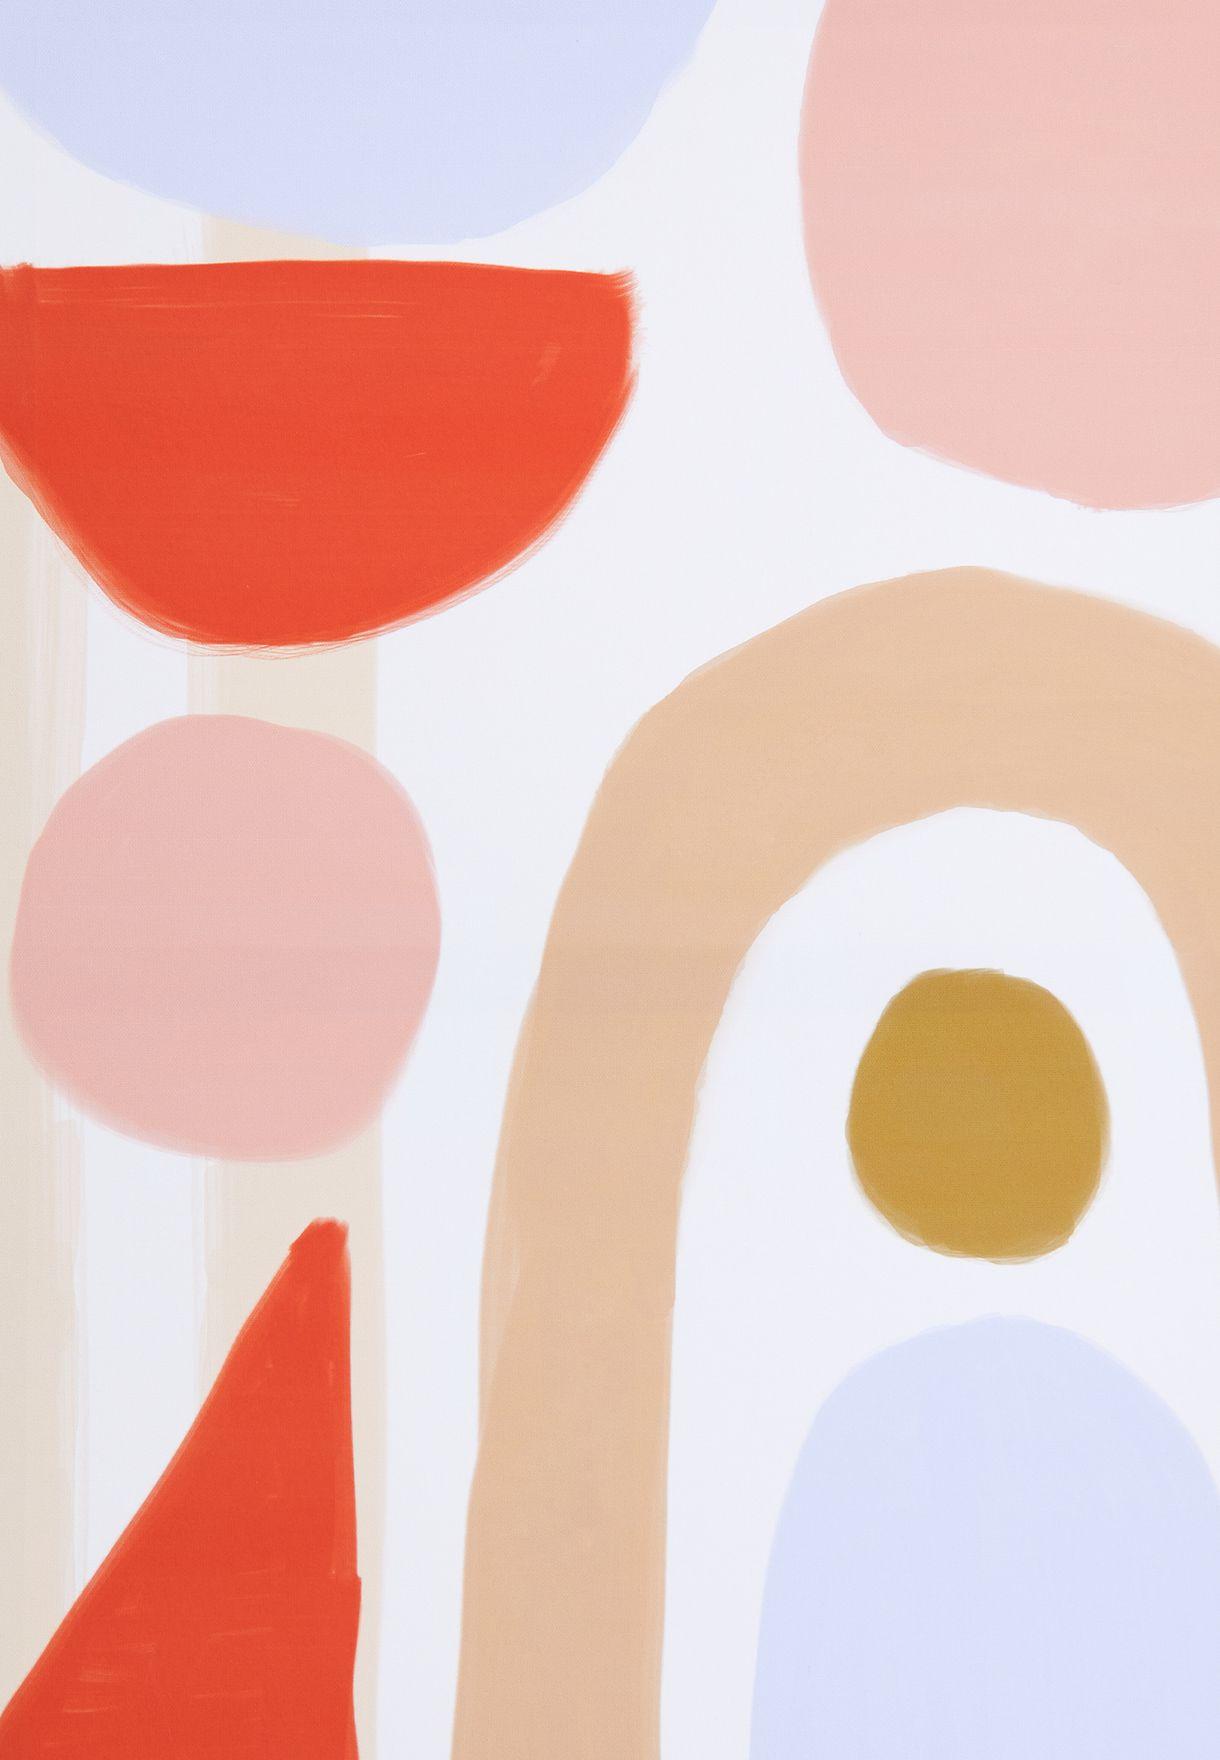 40 X 60 Canvas Wall Art